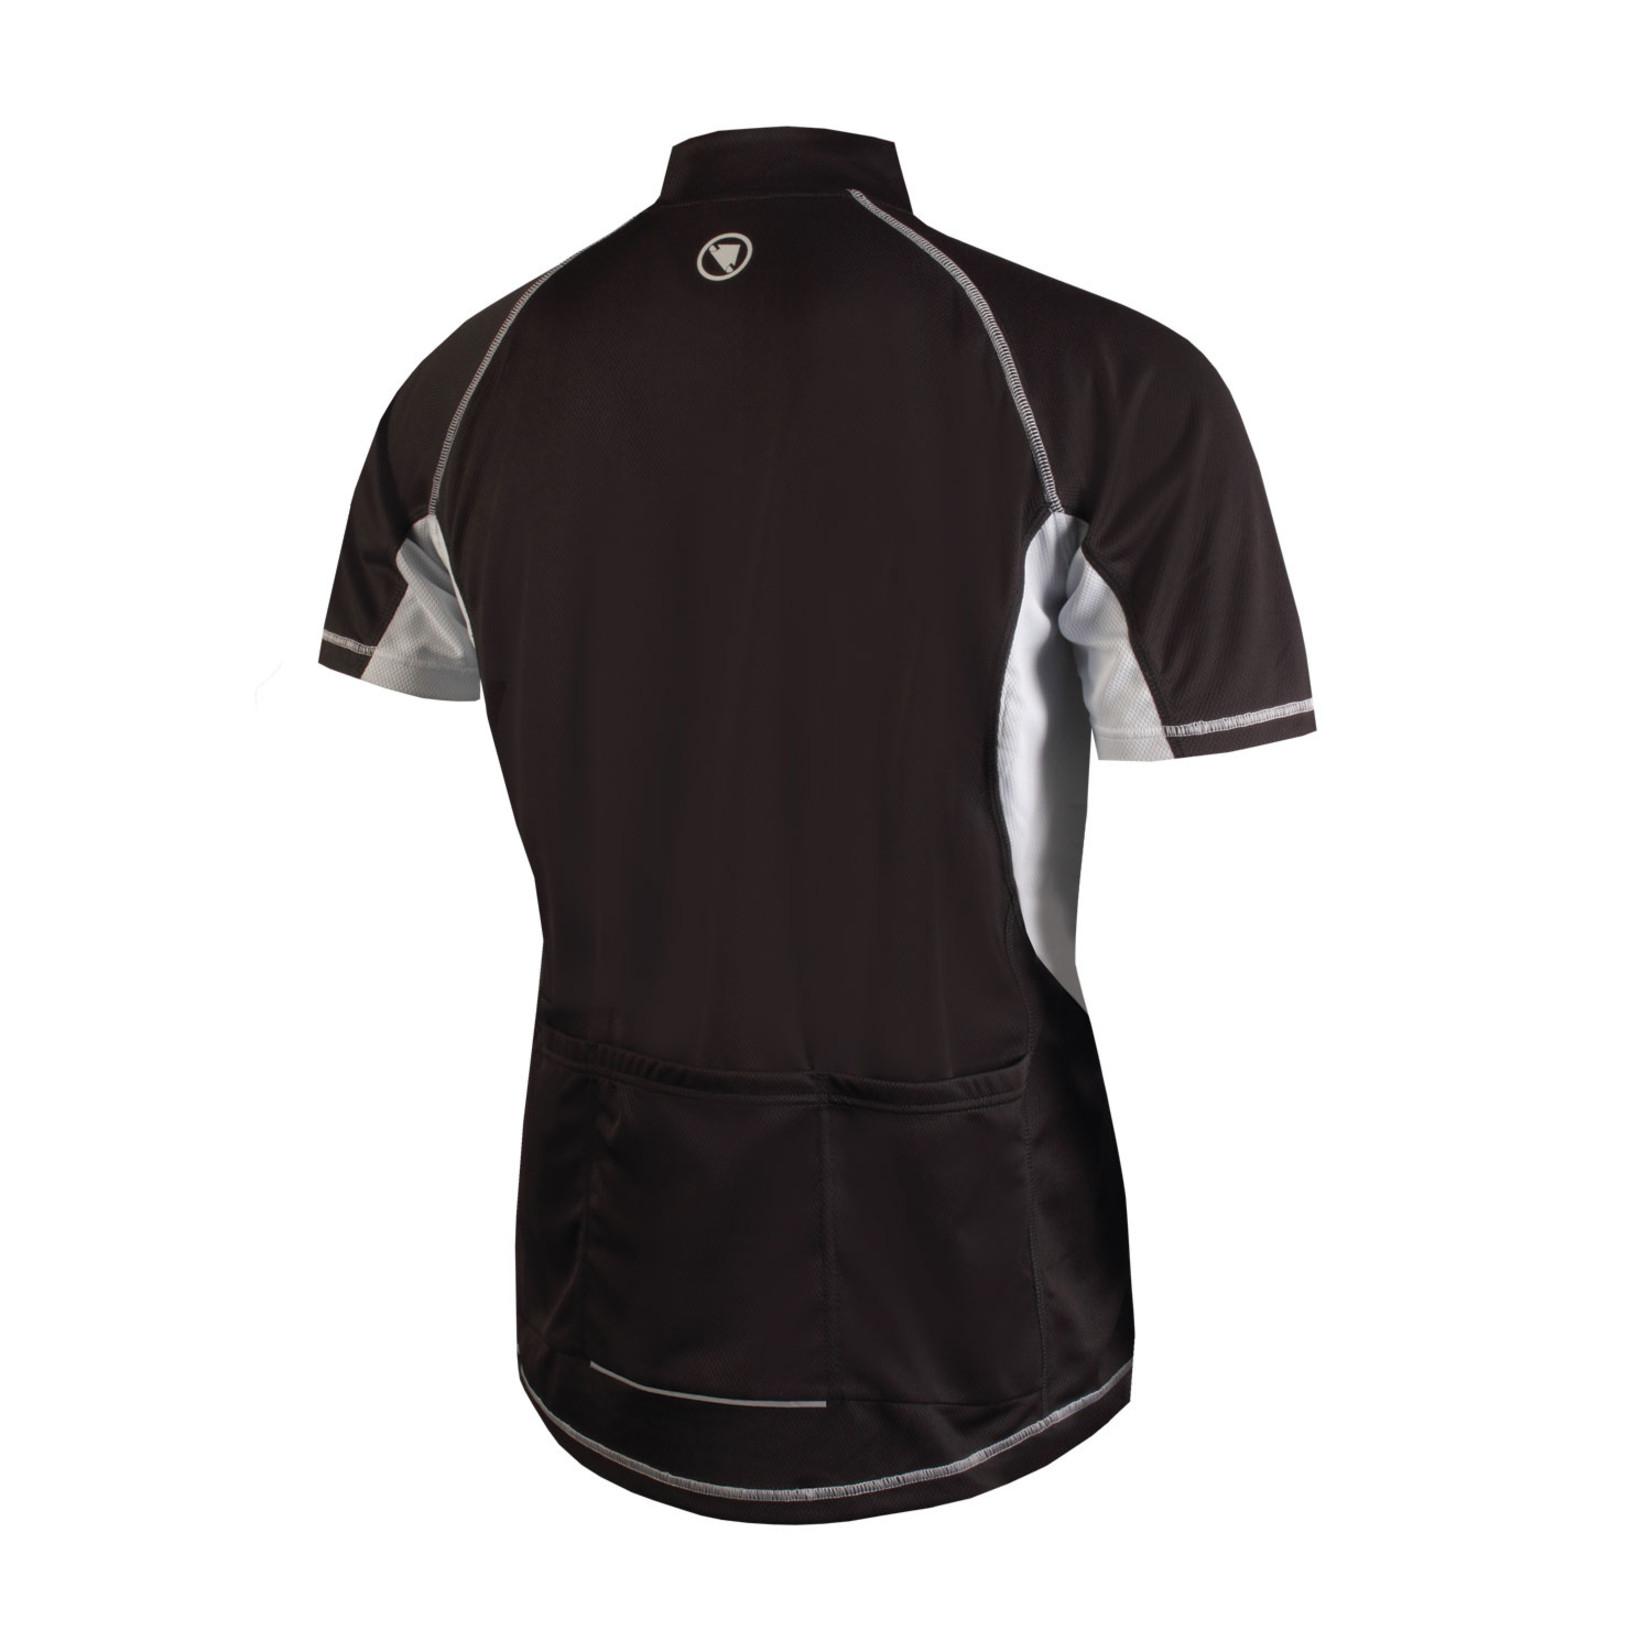 Cairn S/S T-Shirt Black Grey M